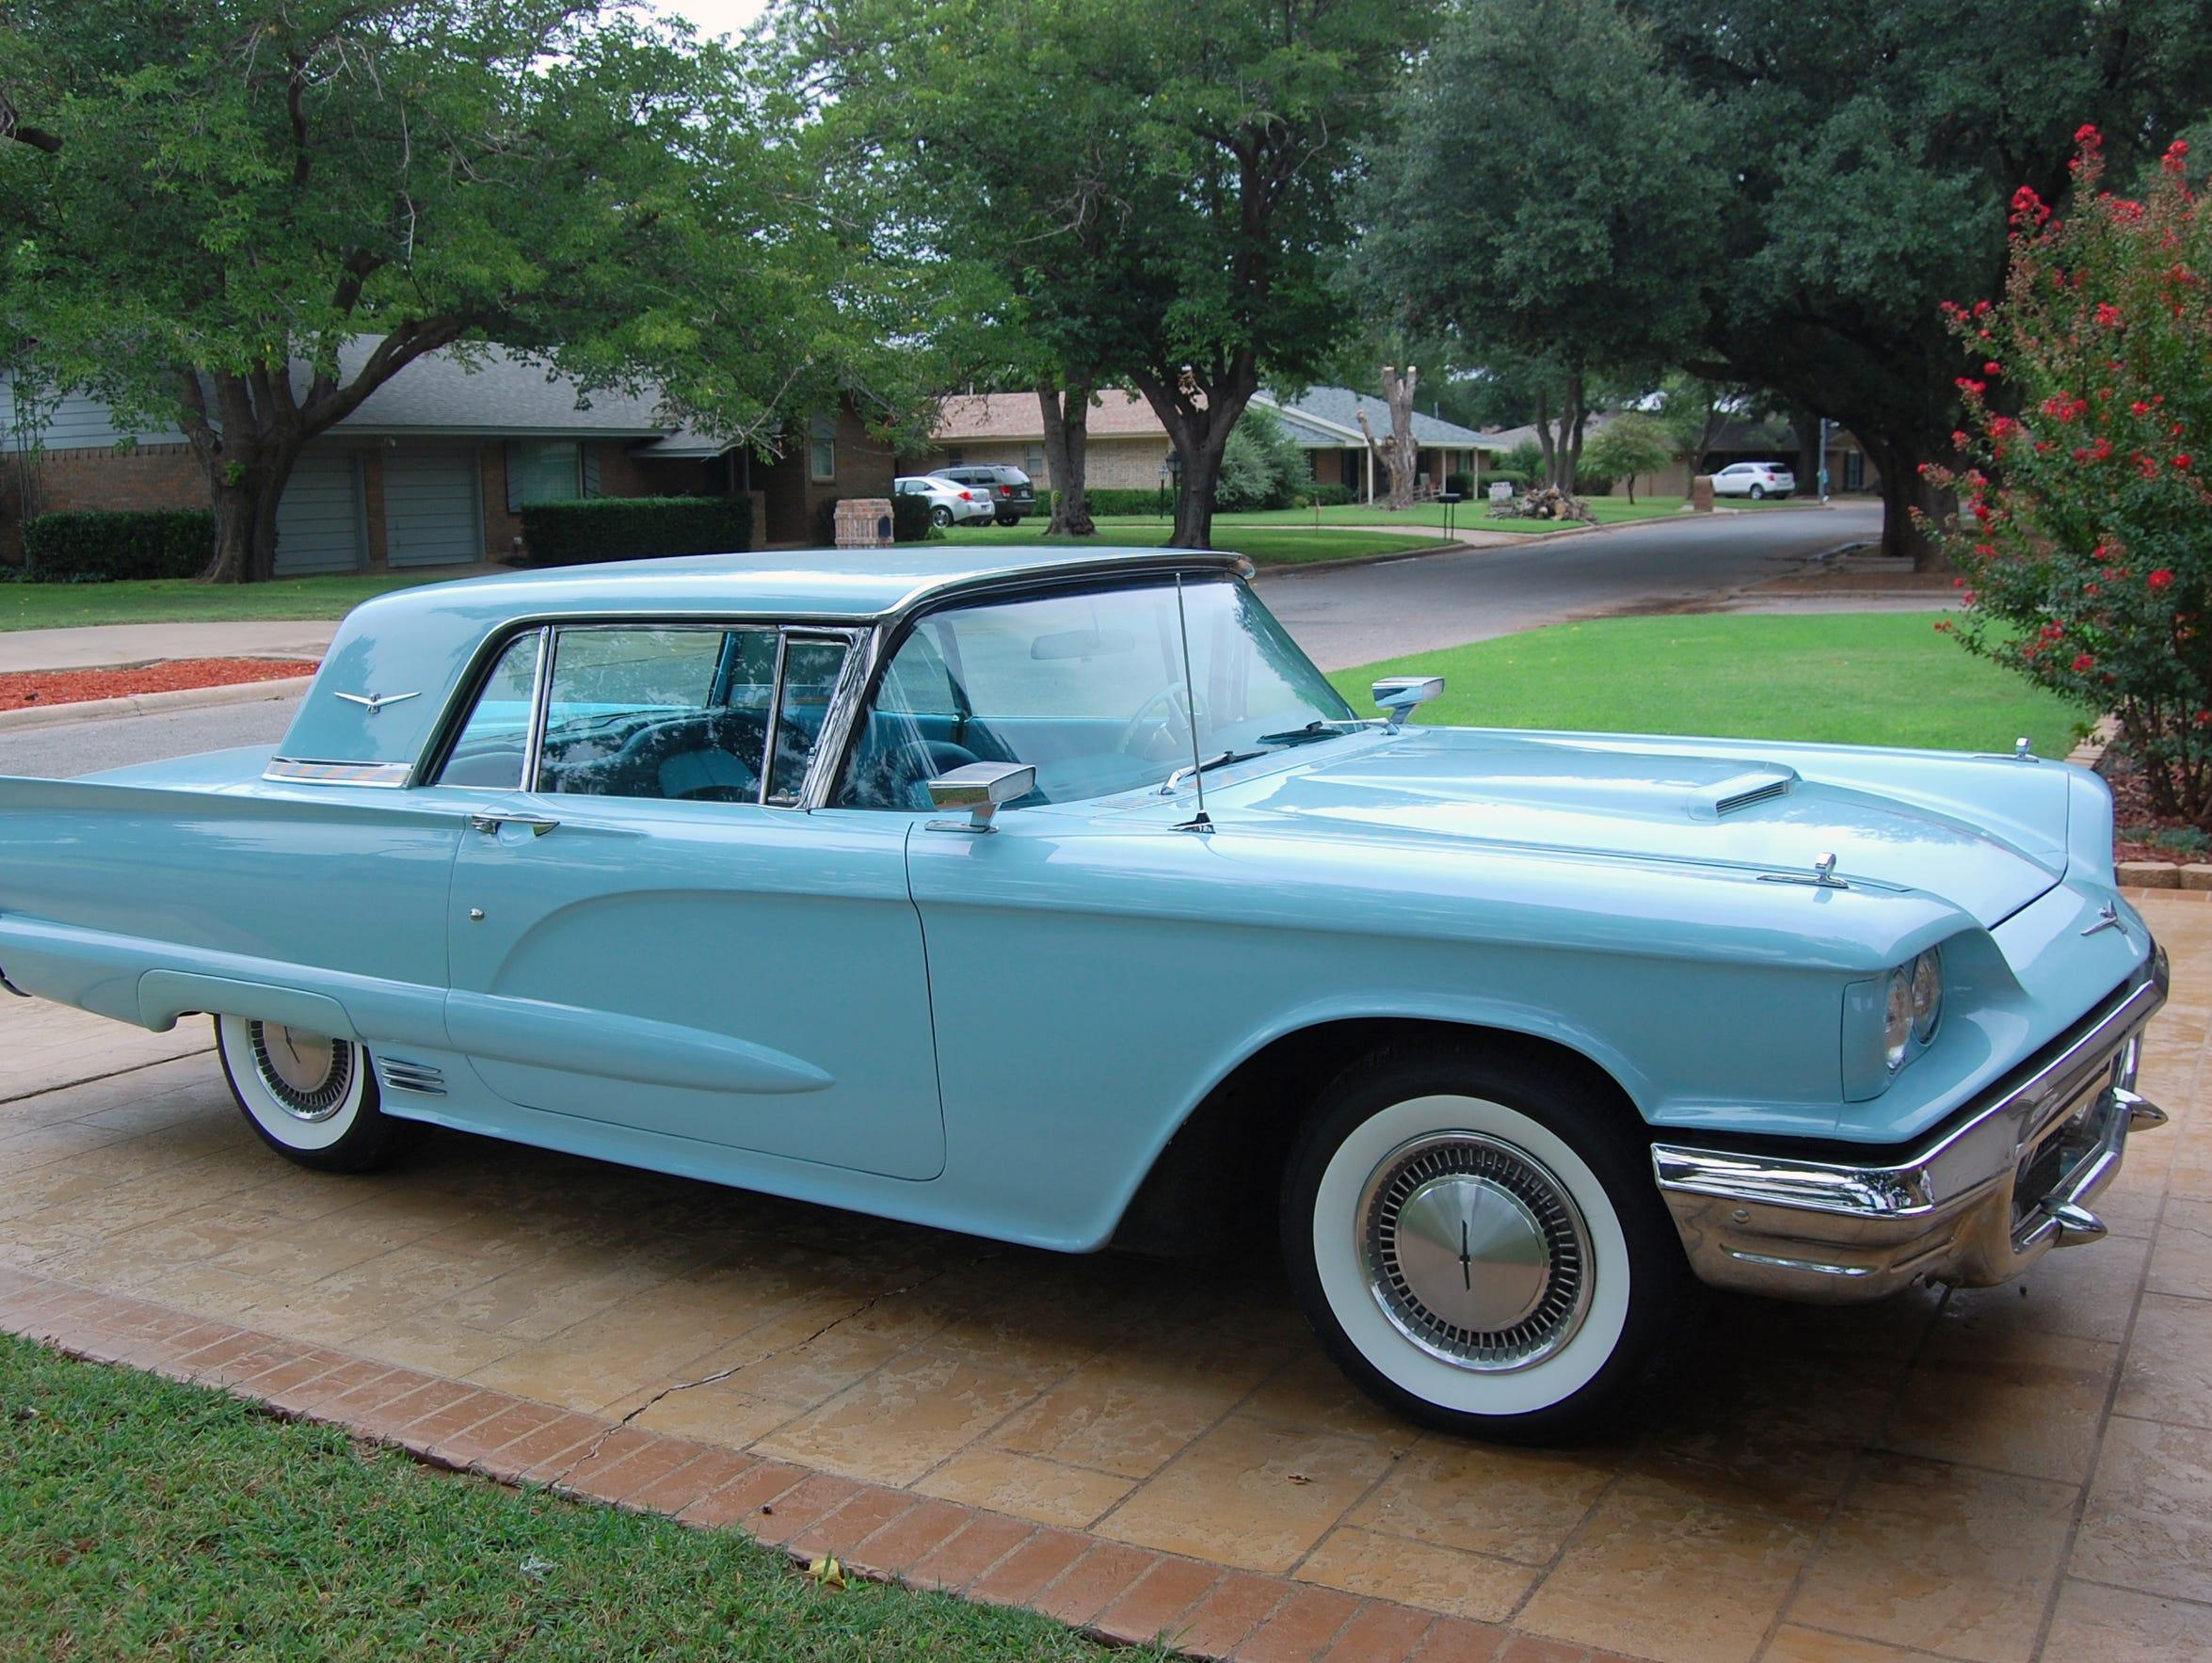 VERNON – Reg Baldwin's 1960 Thunderbird got a new coat